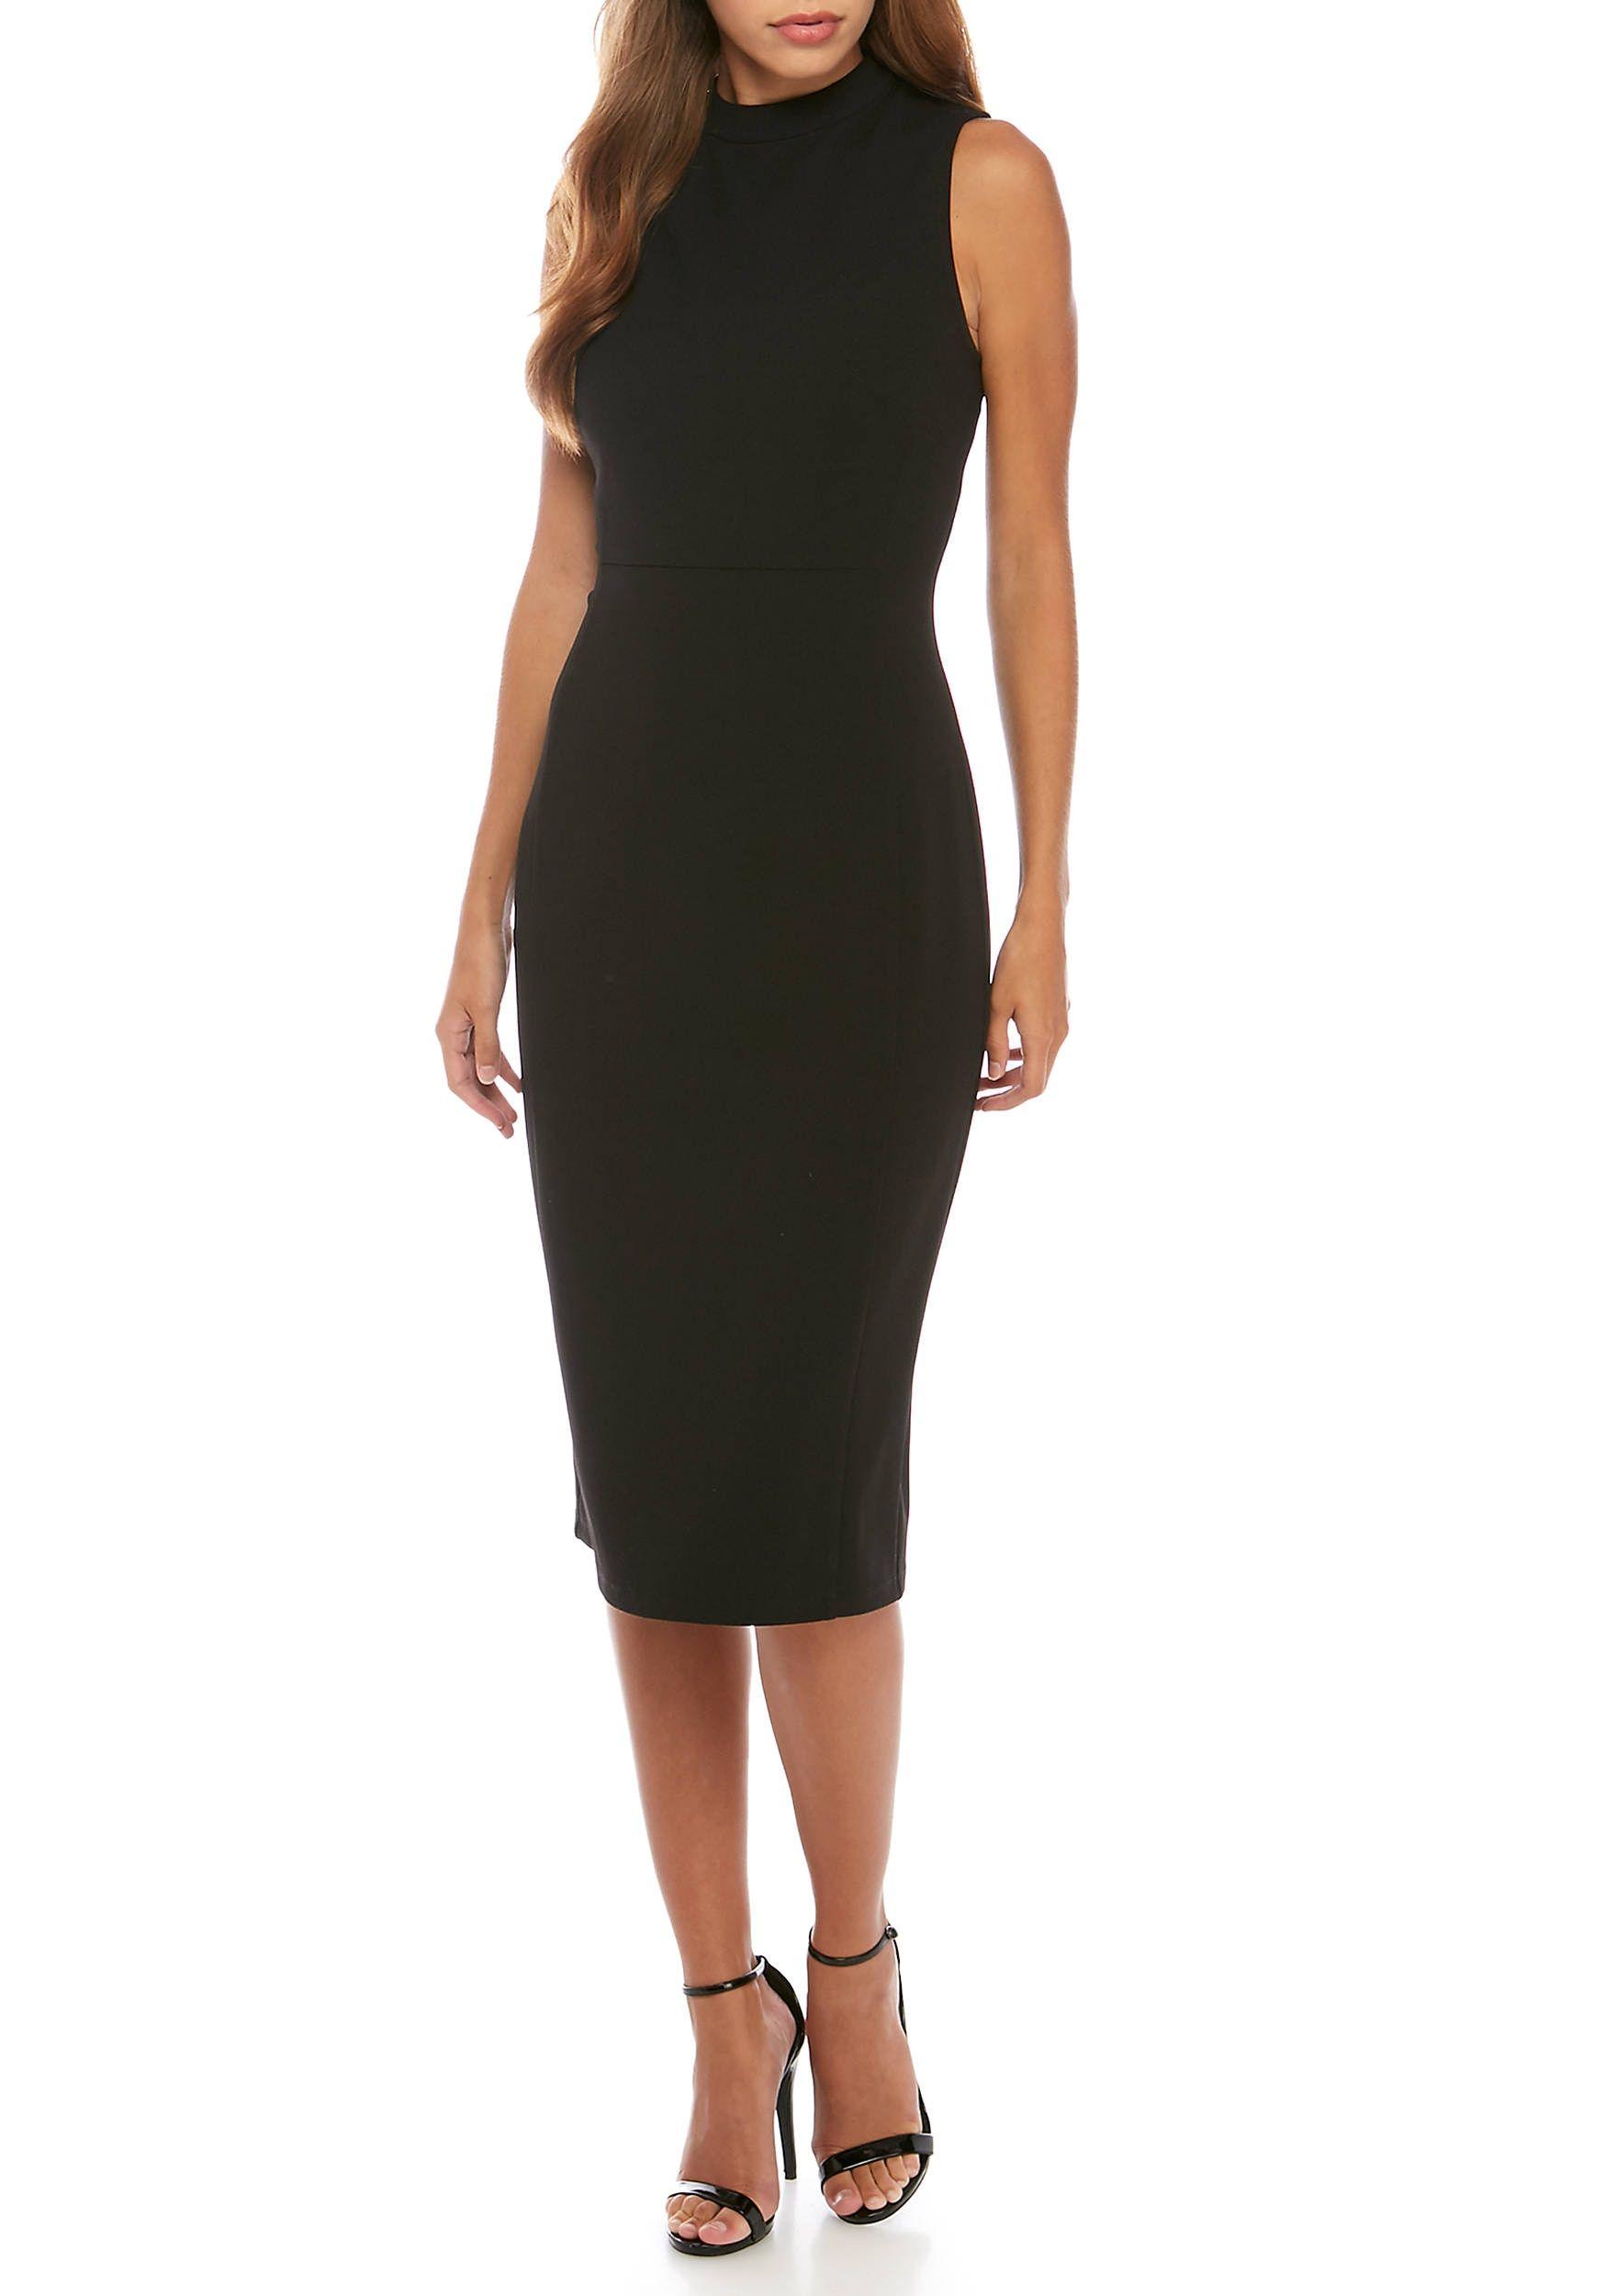 818954669b0c Nine West Drape Crepe Mock Neck Sheath Dress | LBD | Sheath Dress ...